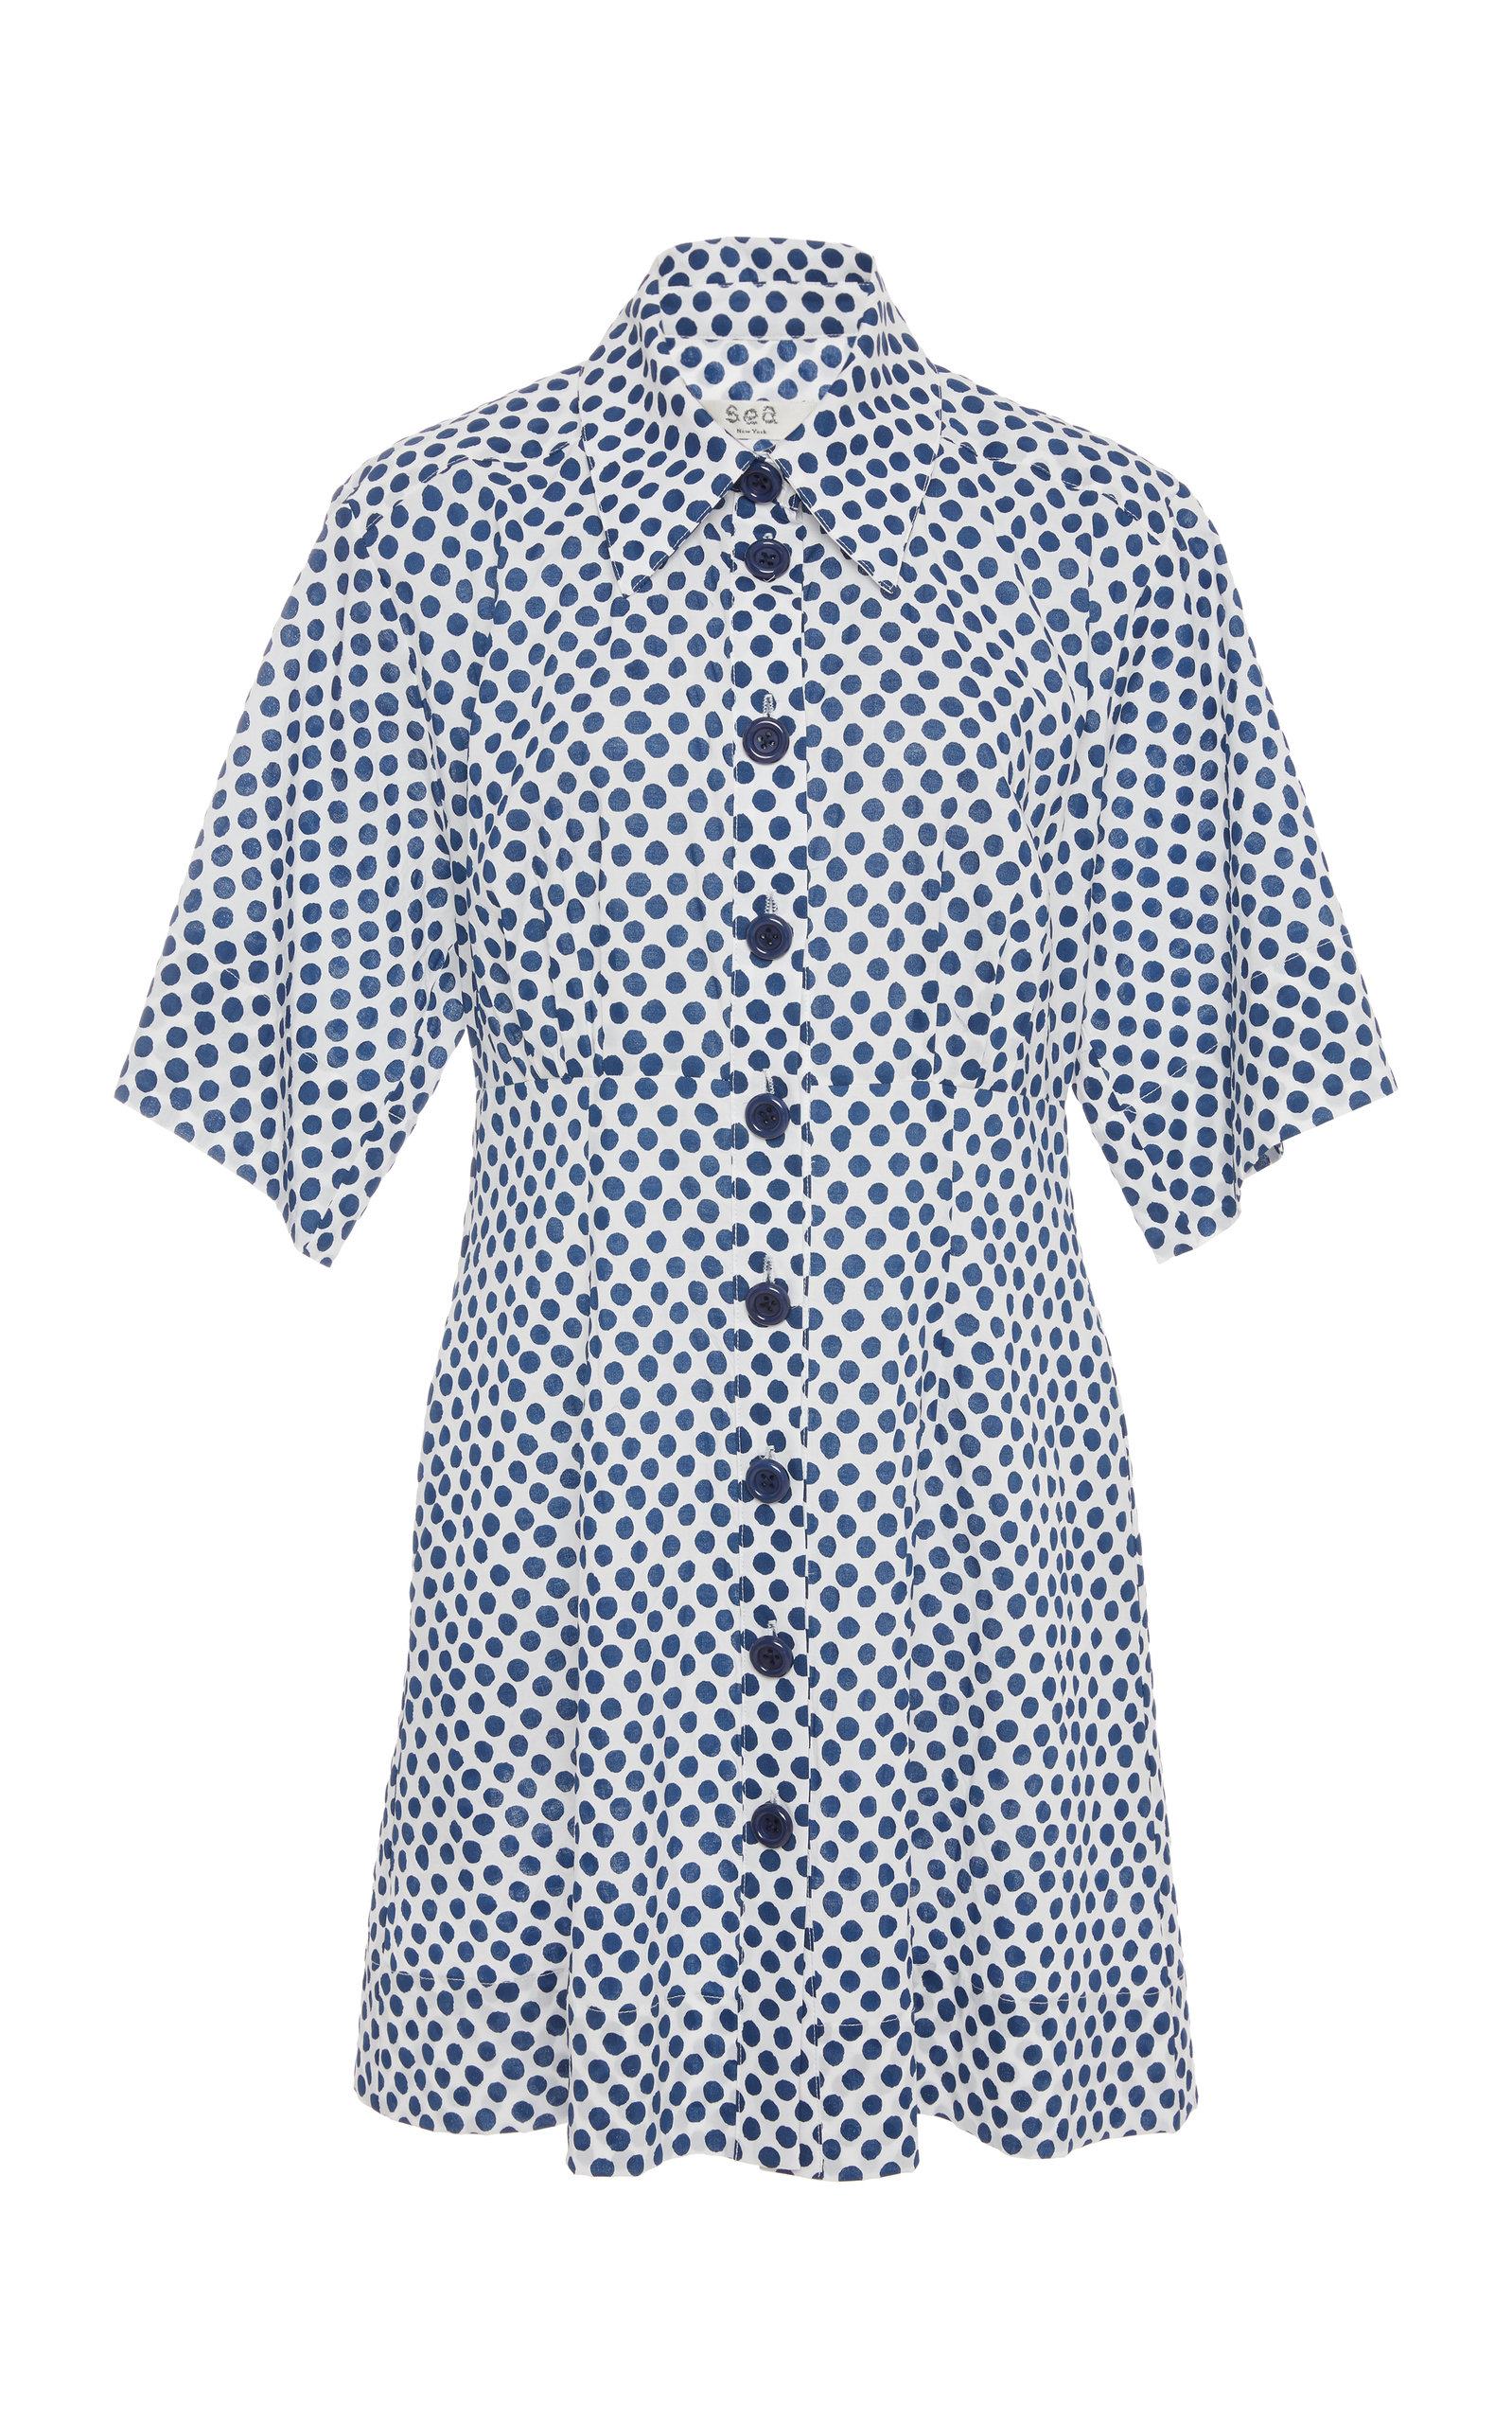 Sea POLKA DOT COTTON SHIRT DRESS